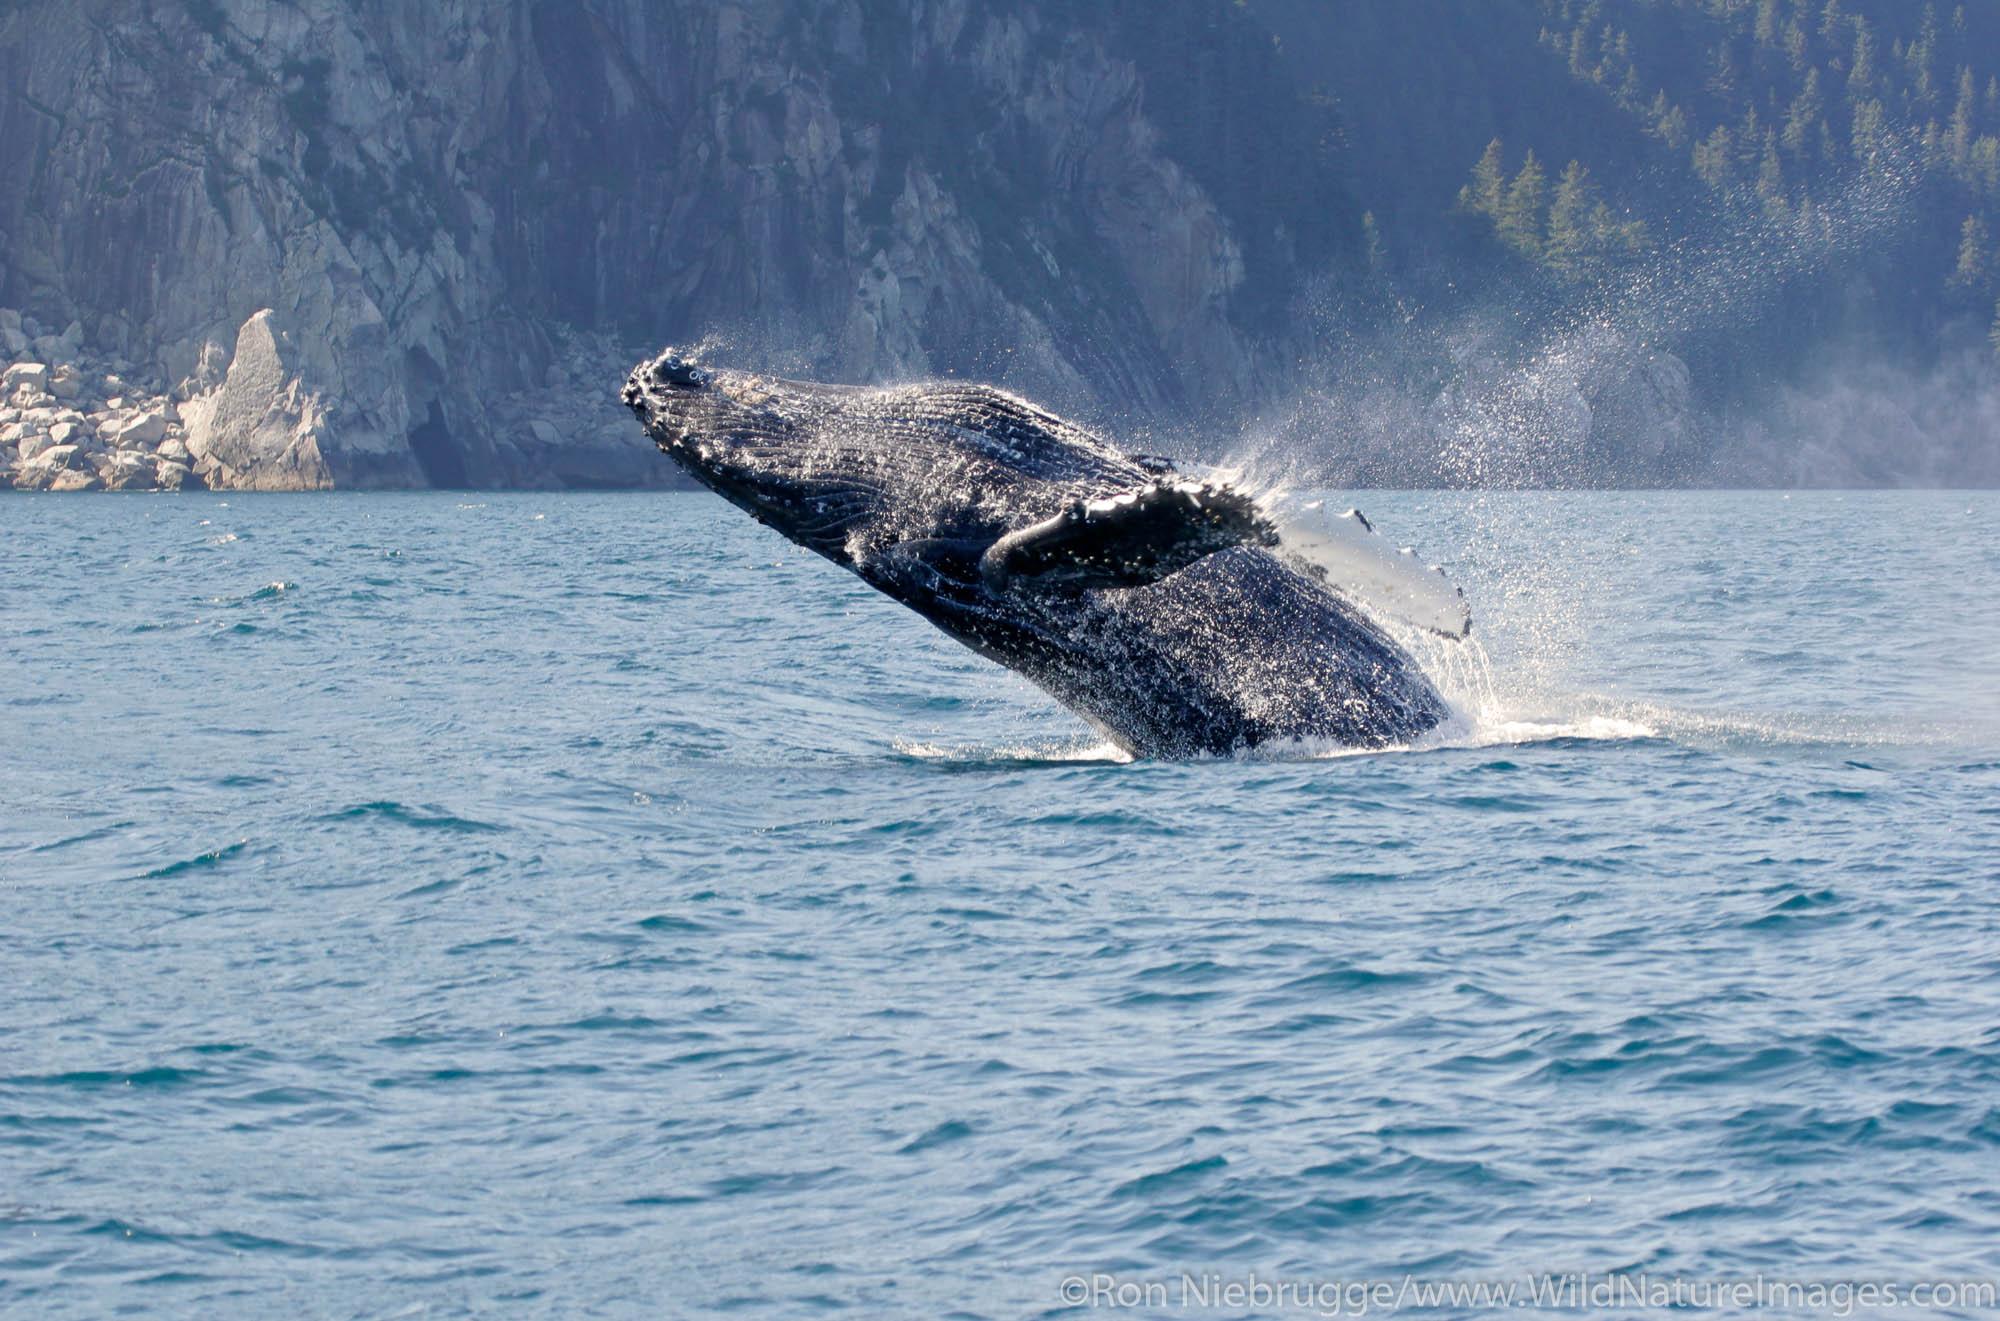 A humpback whale (Magaptera novaeangliae) near Aialik Cape, Kenai Fjords National Park, Alaska.